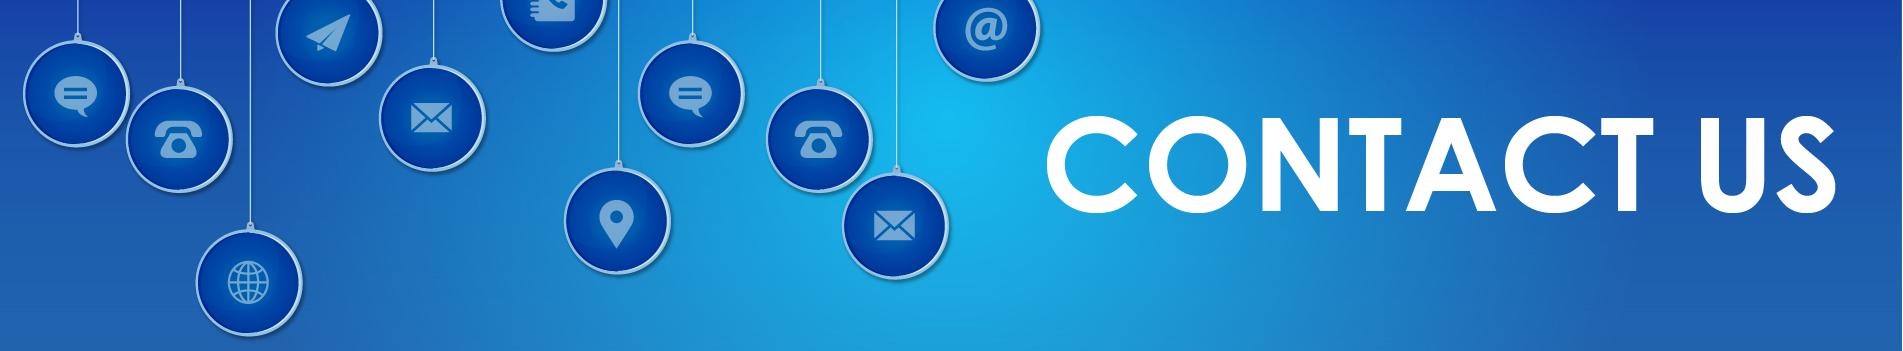 Contact for Website Design, Web Development, Graphic Design, Printing, SEO service, Marketing